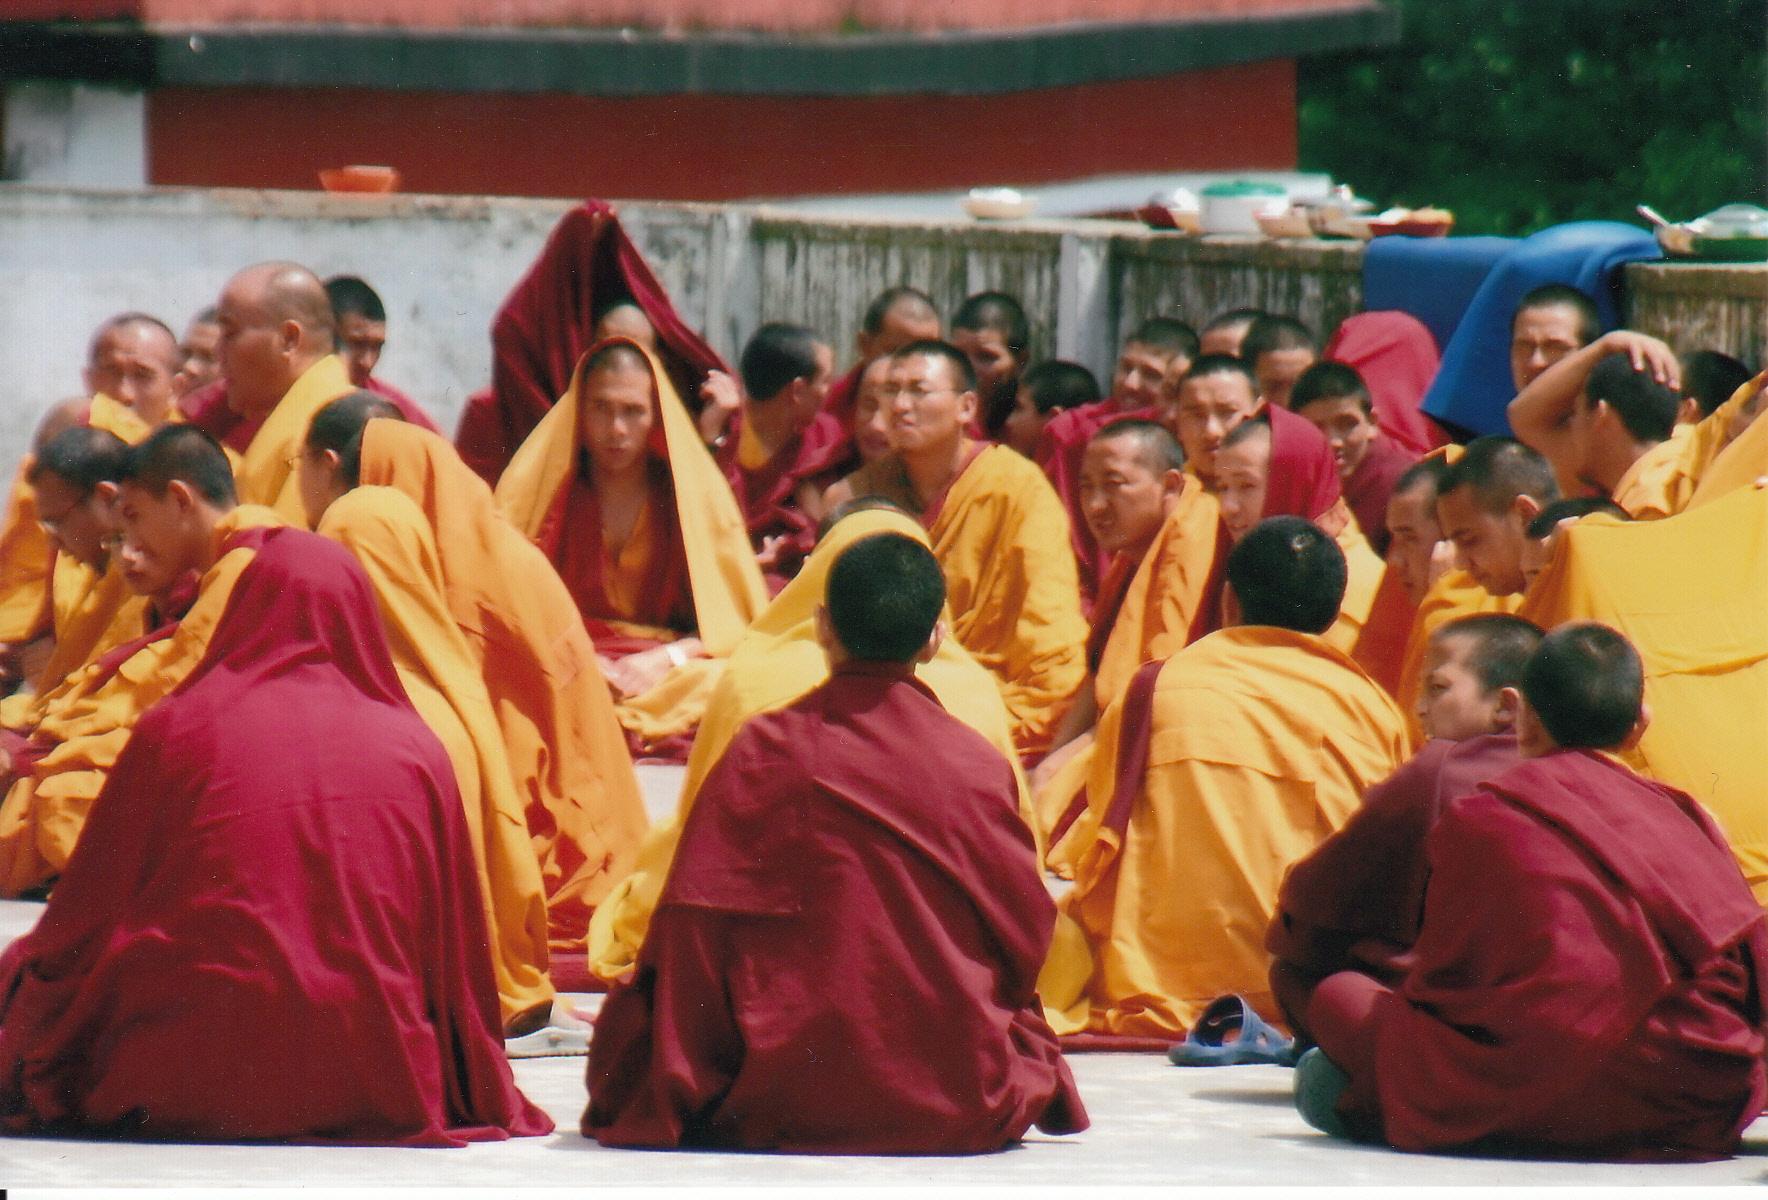 Festival kalender Sikkim - Sikkim - Atma Asia Travel